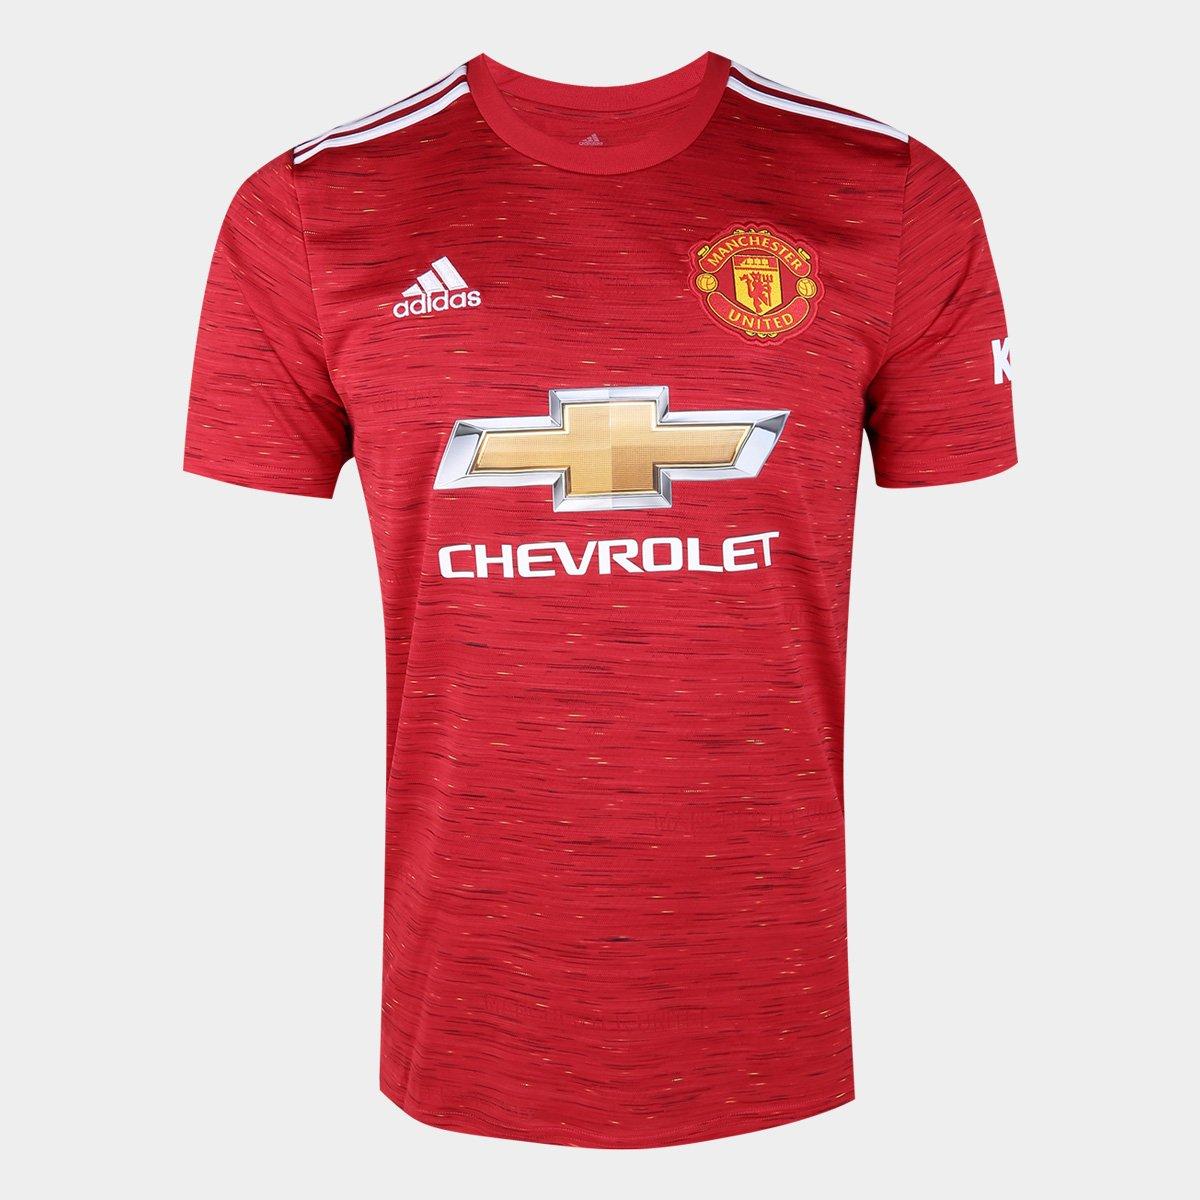 Camisa Manchester United Home 20/21 s/n° Torcedor Adidas Masculina